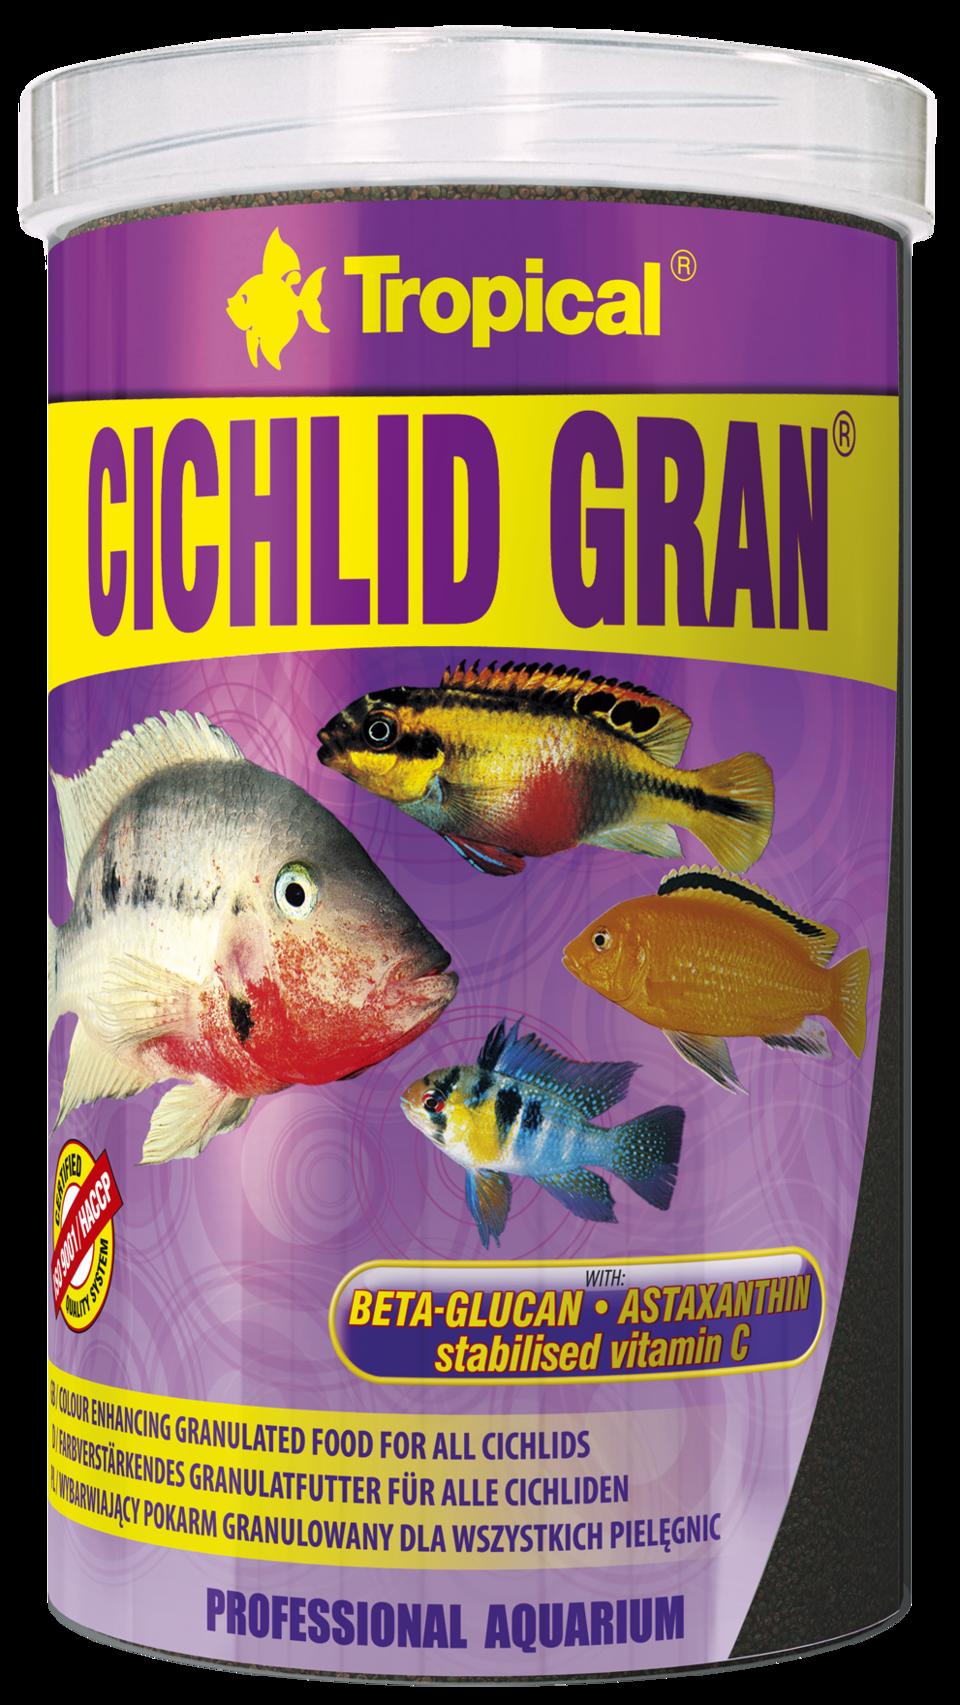 csm_cichlid-gran_1000_c82c836ef7